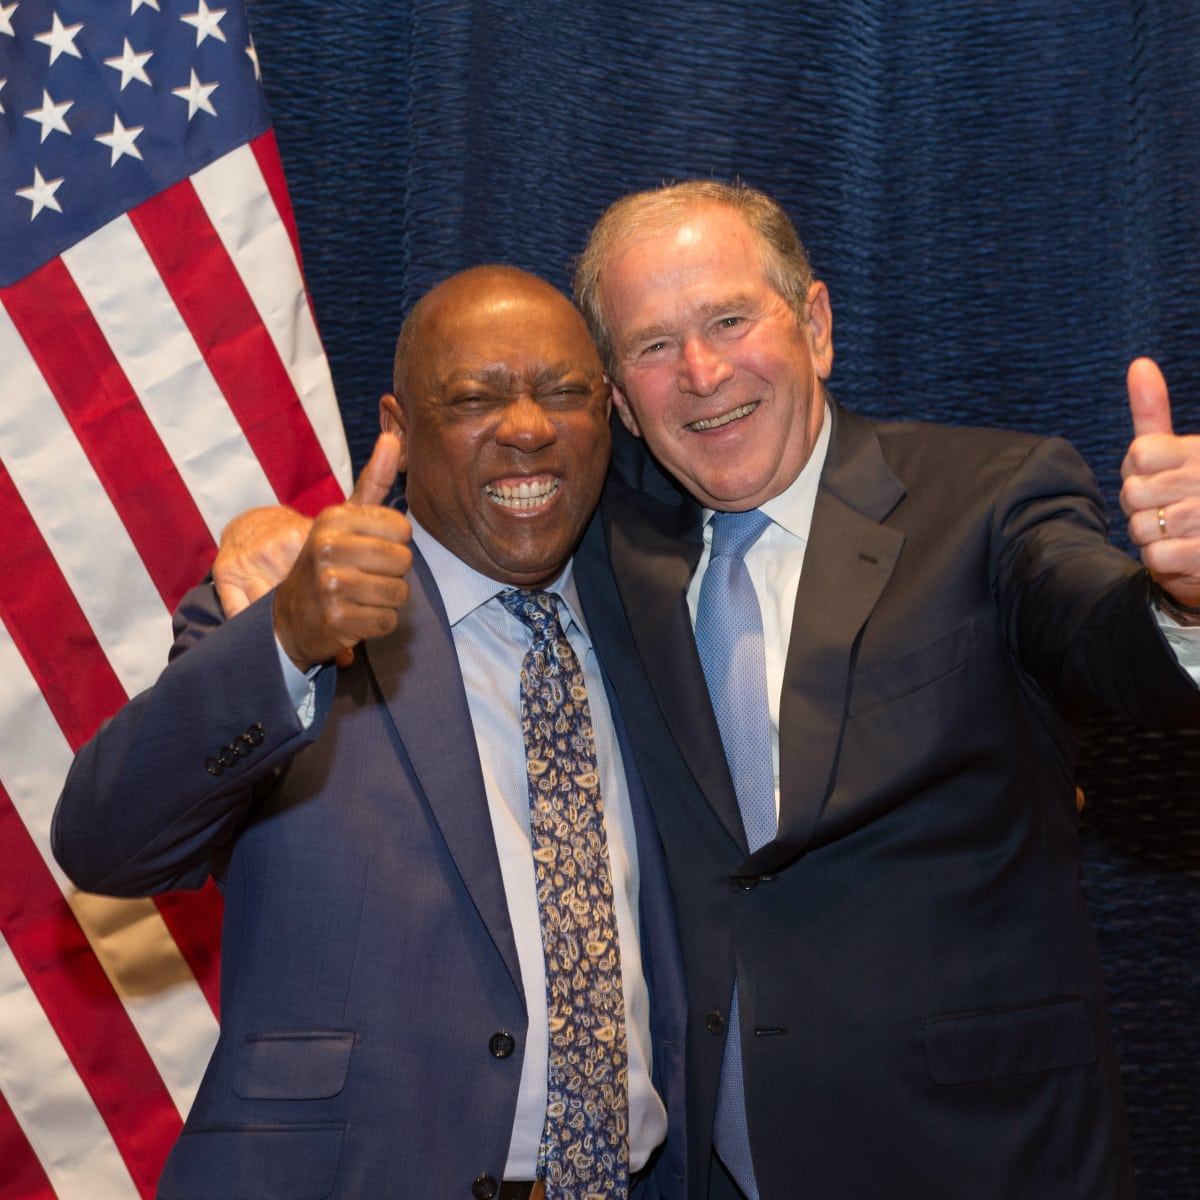 Holocaust Museum LBJ award Mayor Sylvester Turner and President George W. Bush